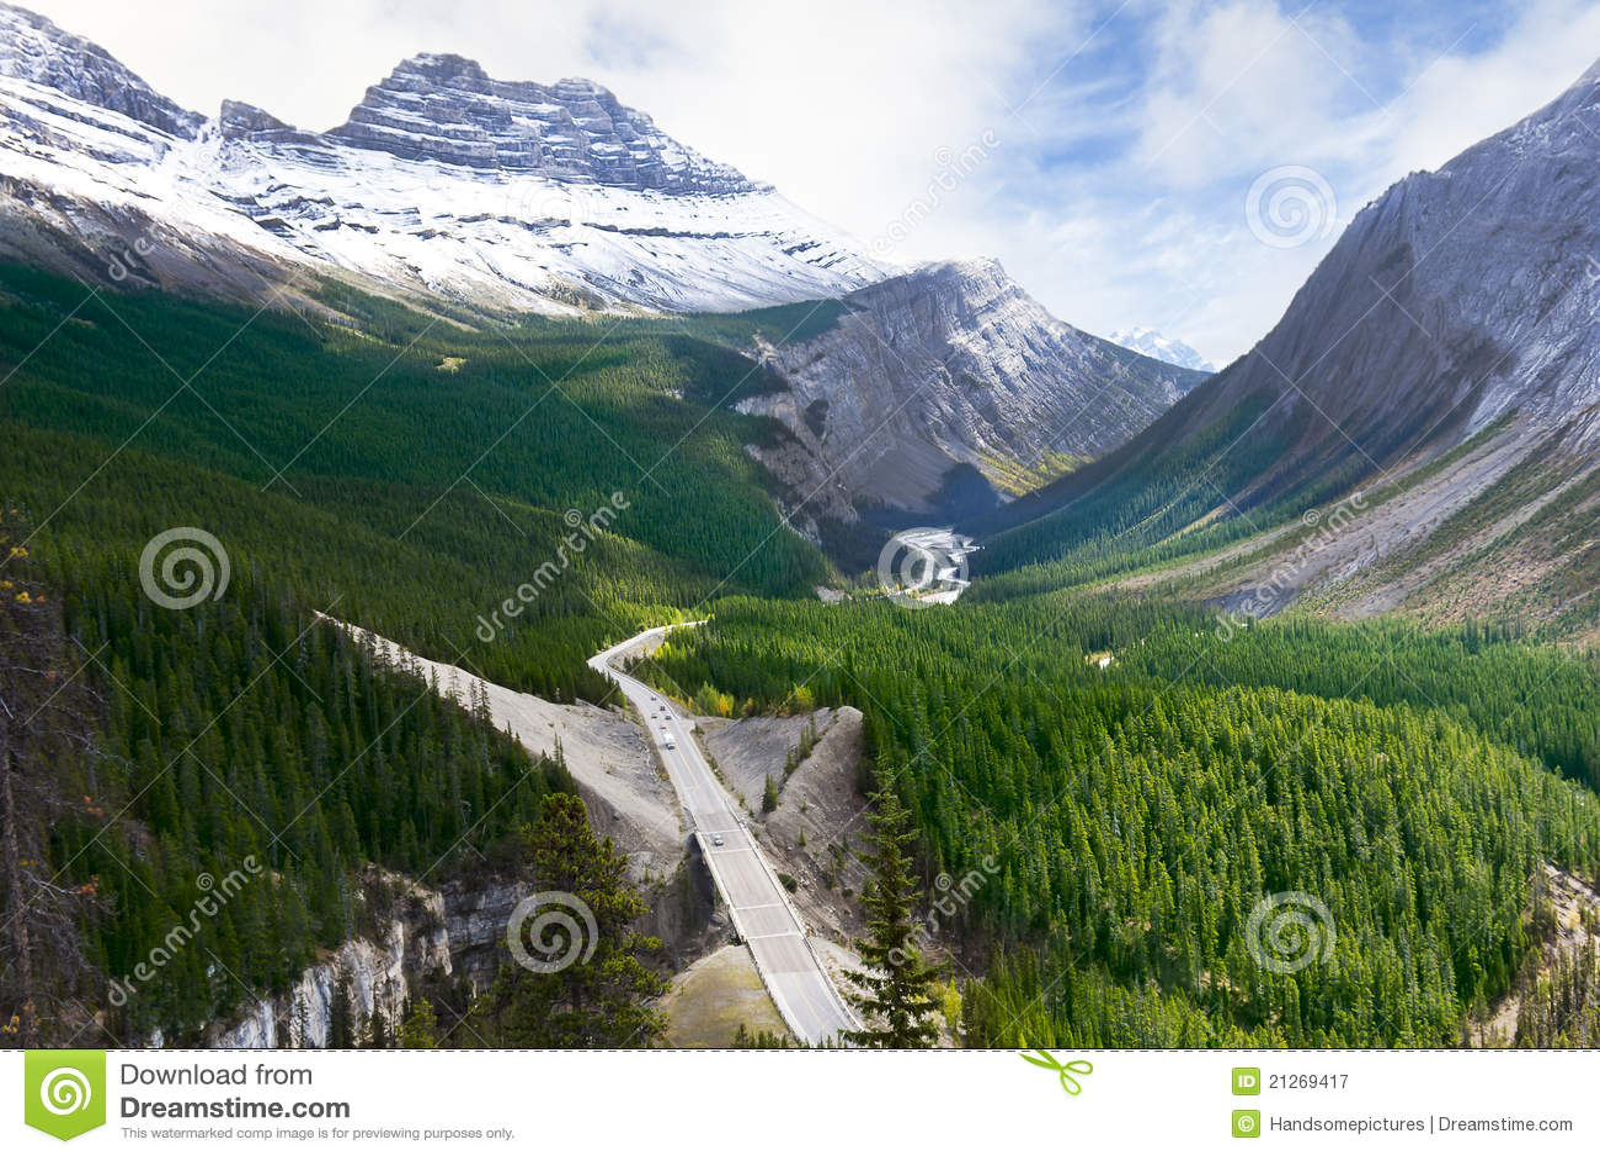 Animal Crossing Desktop Wallpaper Road Through Canadian Rockies Icefields Parkway Stock